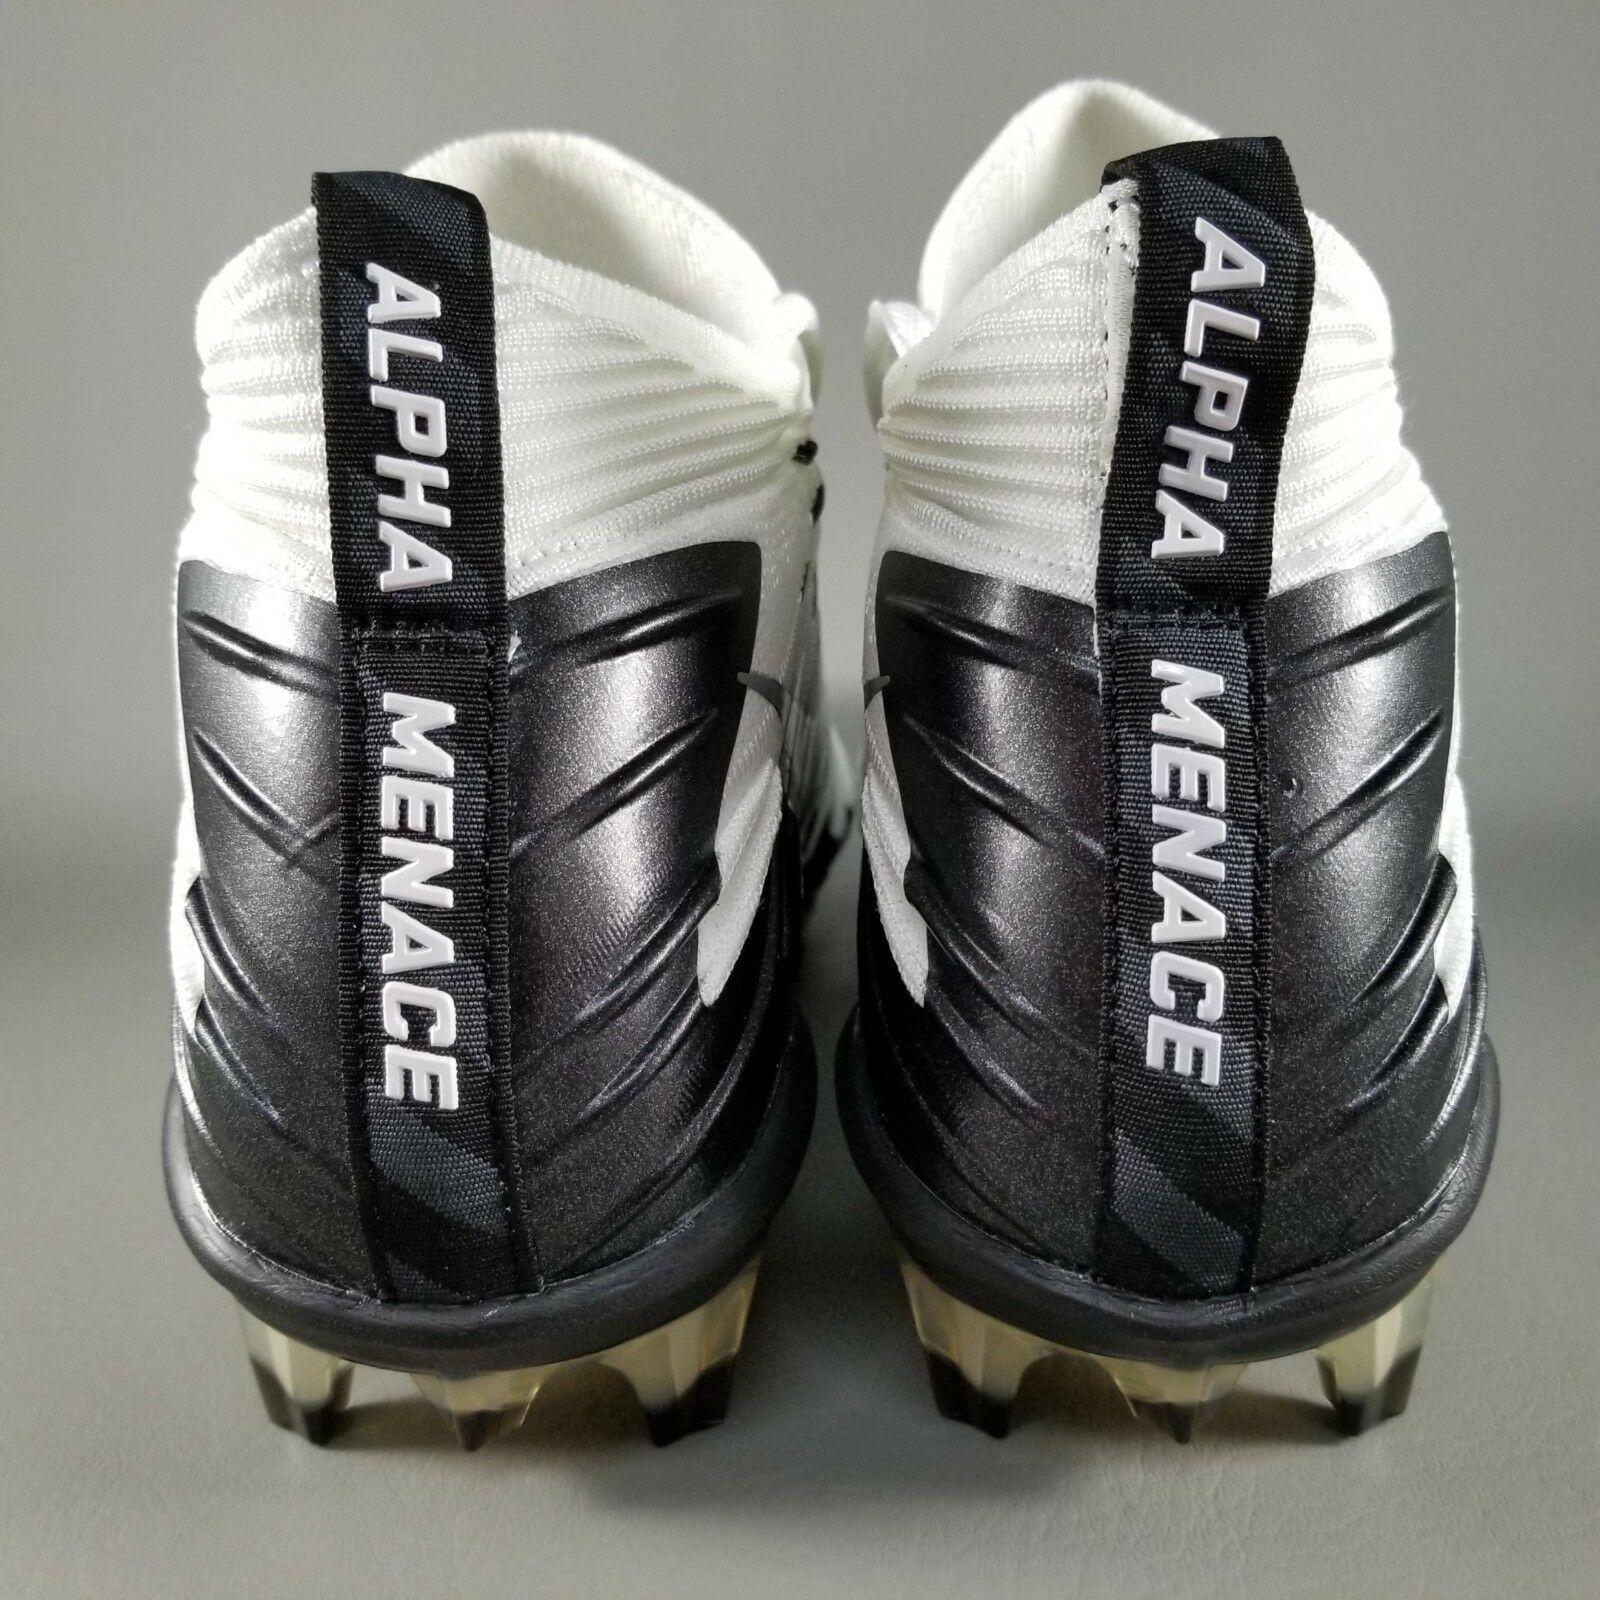 0f1191b2b17 Nike Alpha Menace Elite Size 11.5 Football Cleats FB Boots Mens White Black  Oreo